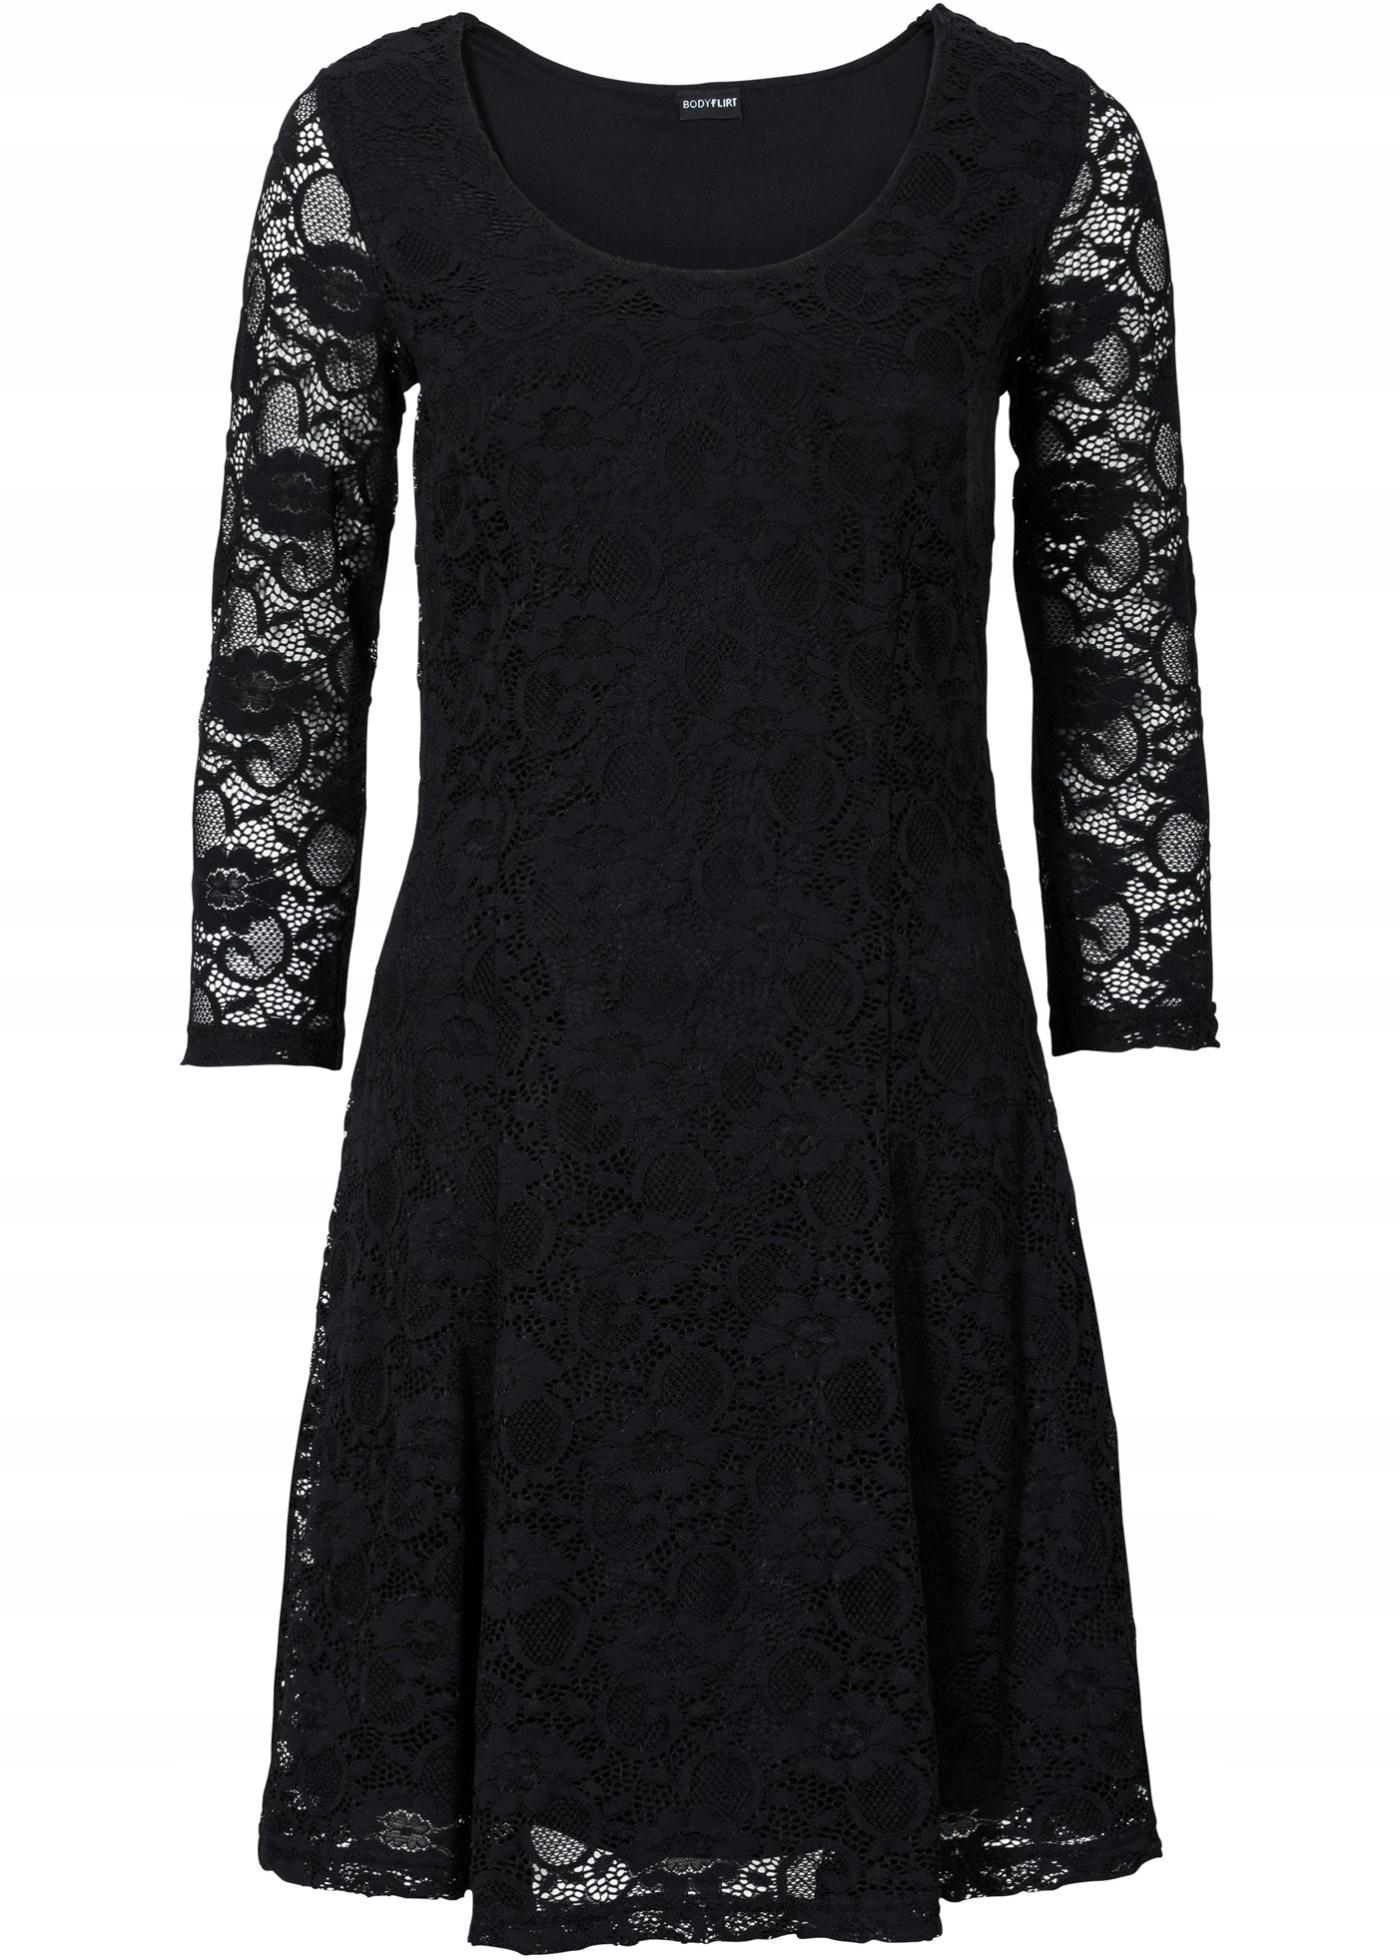 aa1fce18 Bonprix Koronkowa Sukienka rozm 52/54 BODYFLIRT - 7405579826 ...